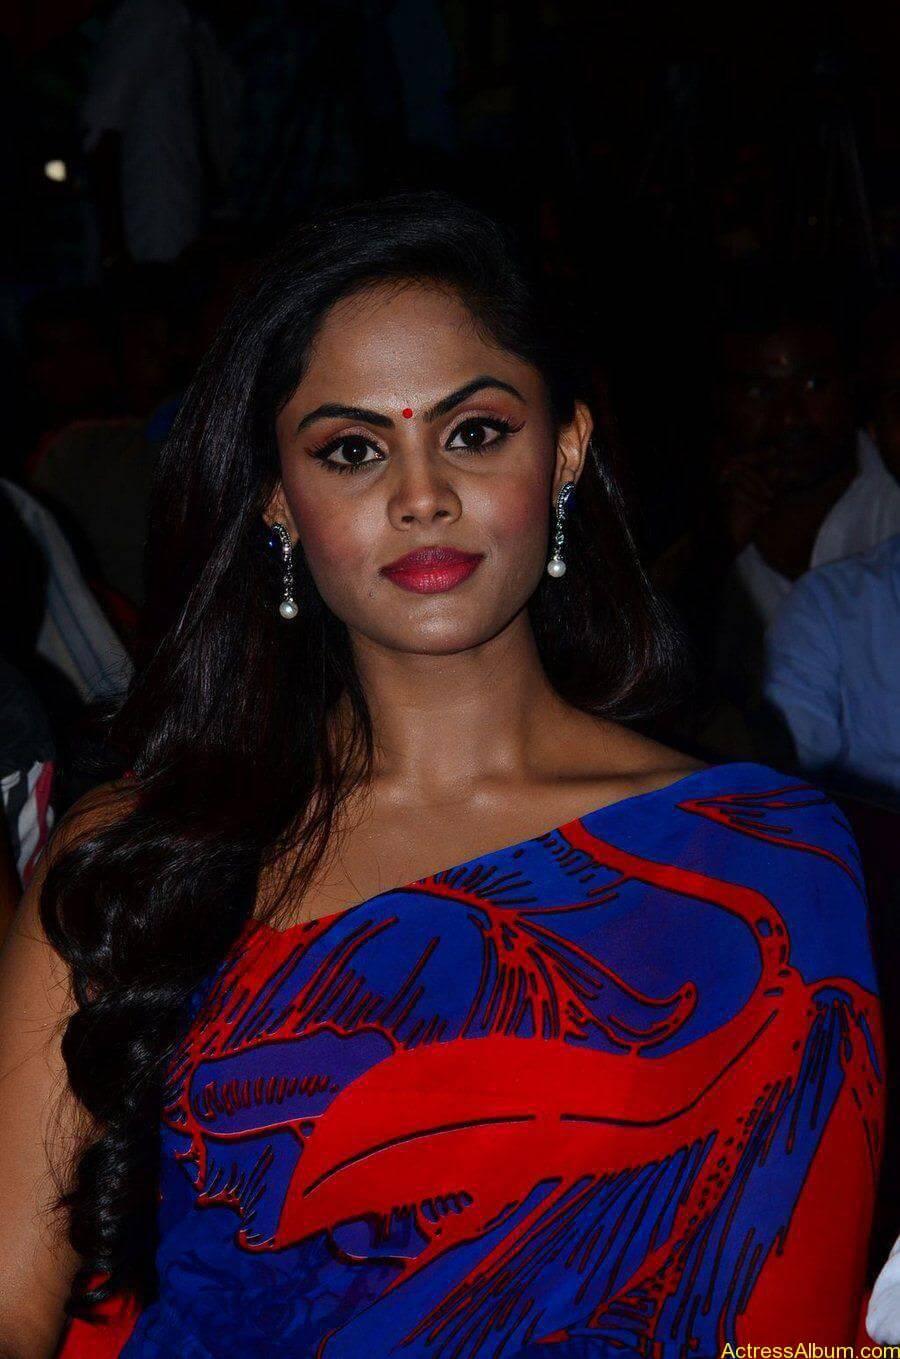 Tamil Actress Karthika Nair Hot in Blue Dress - 4